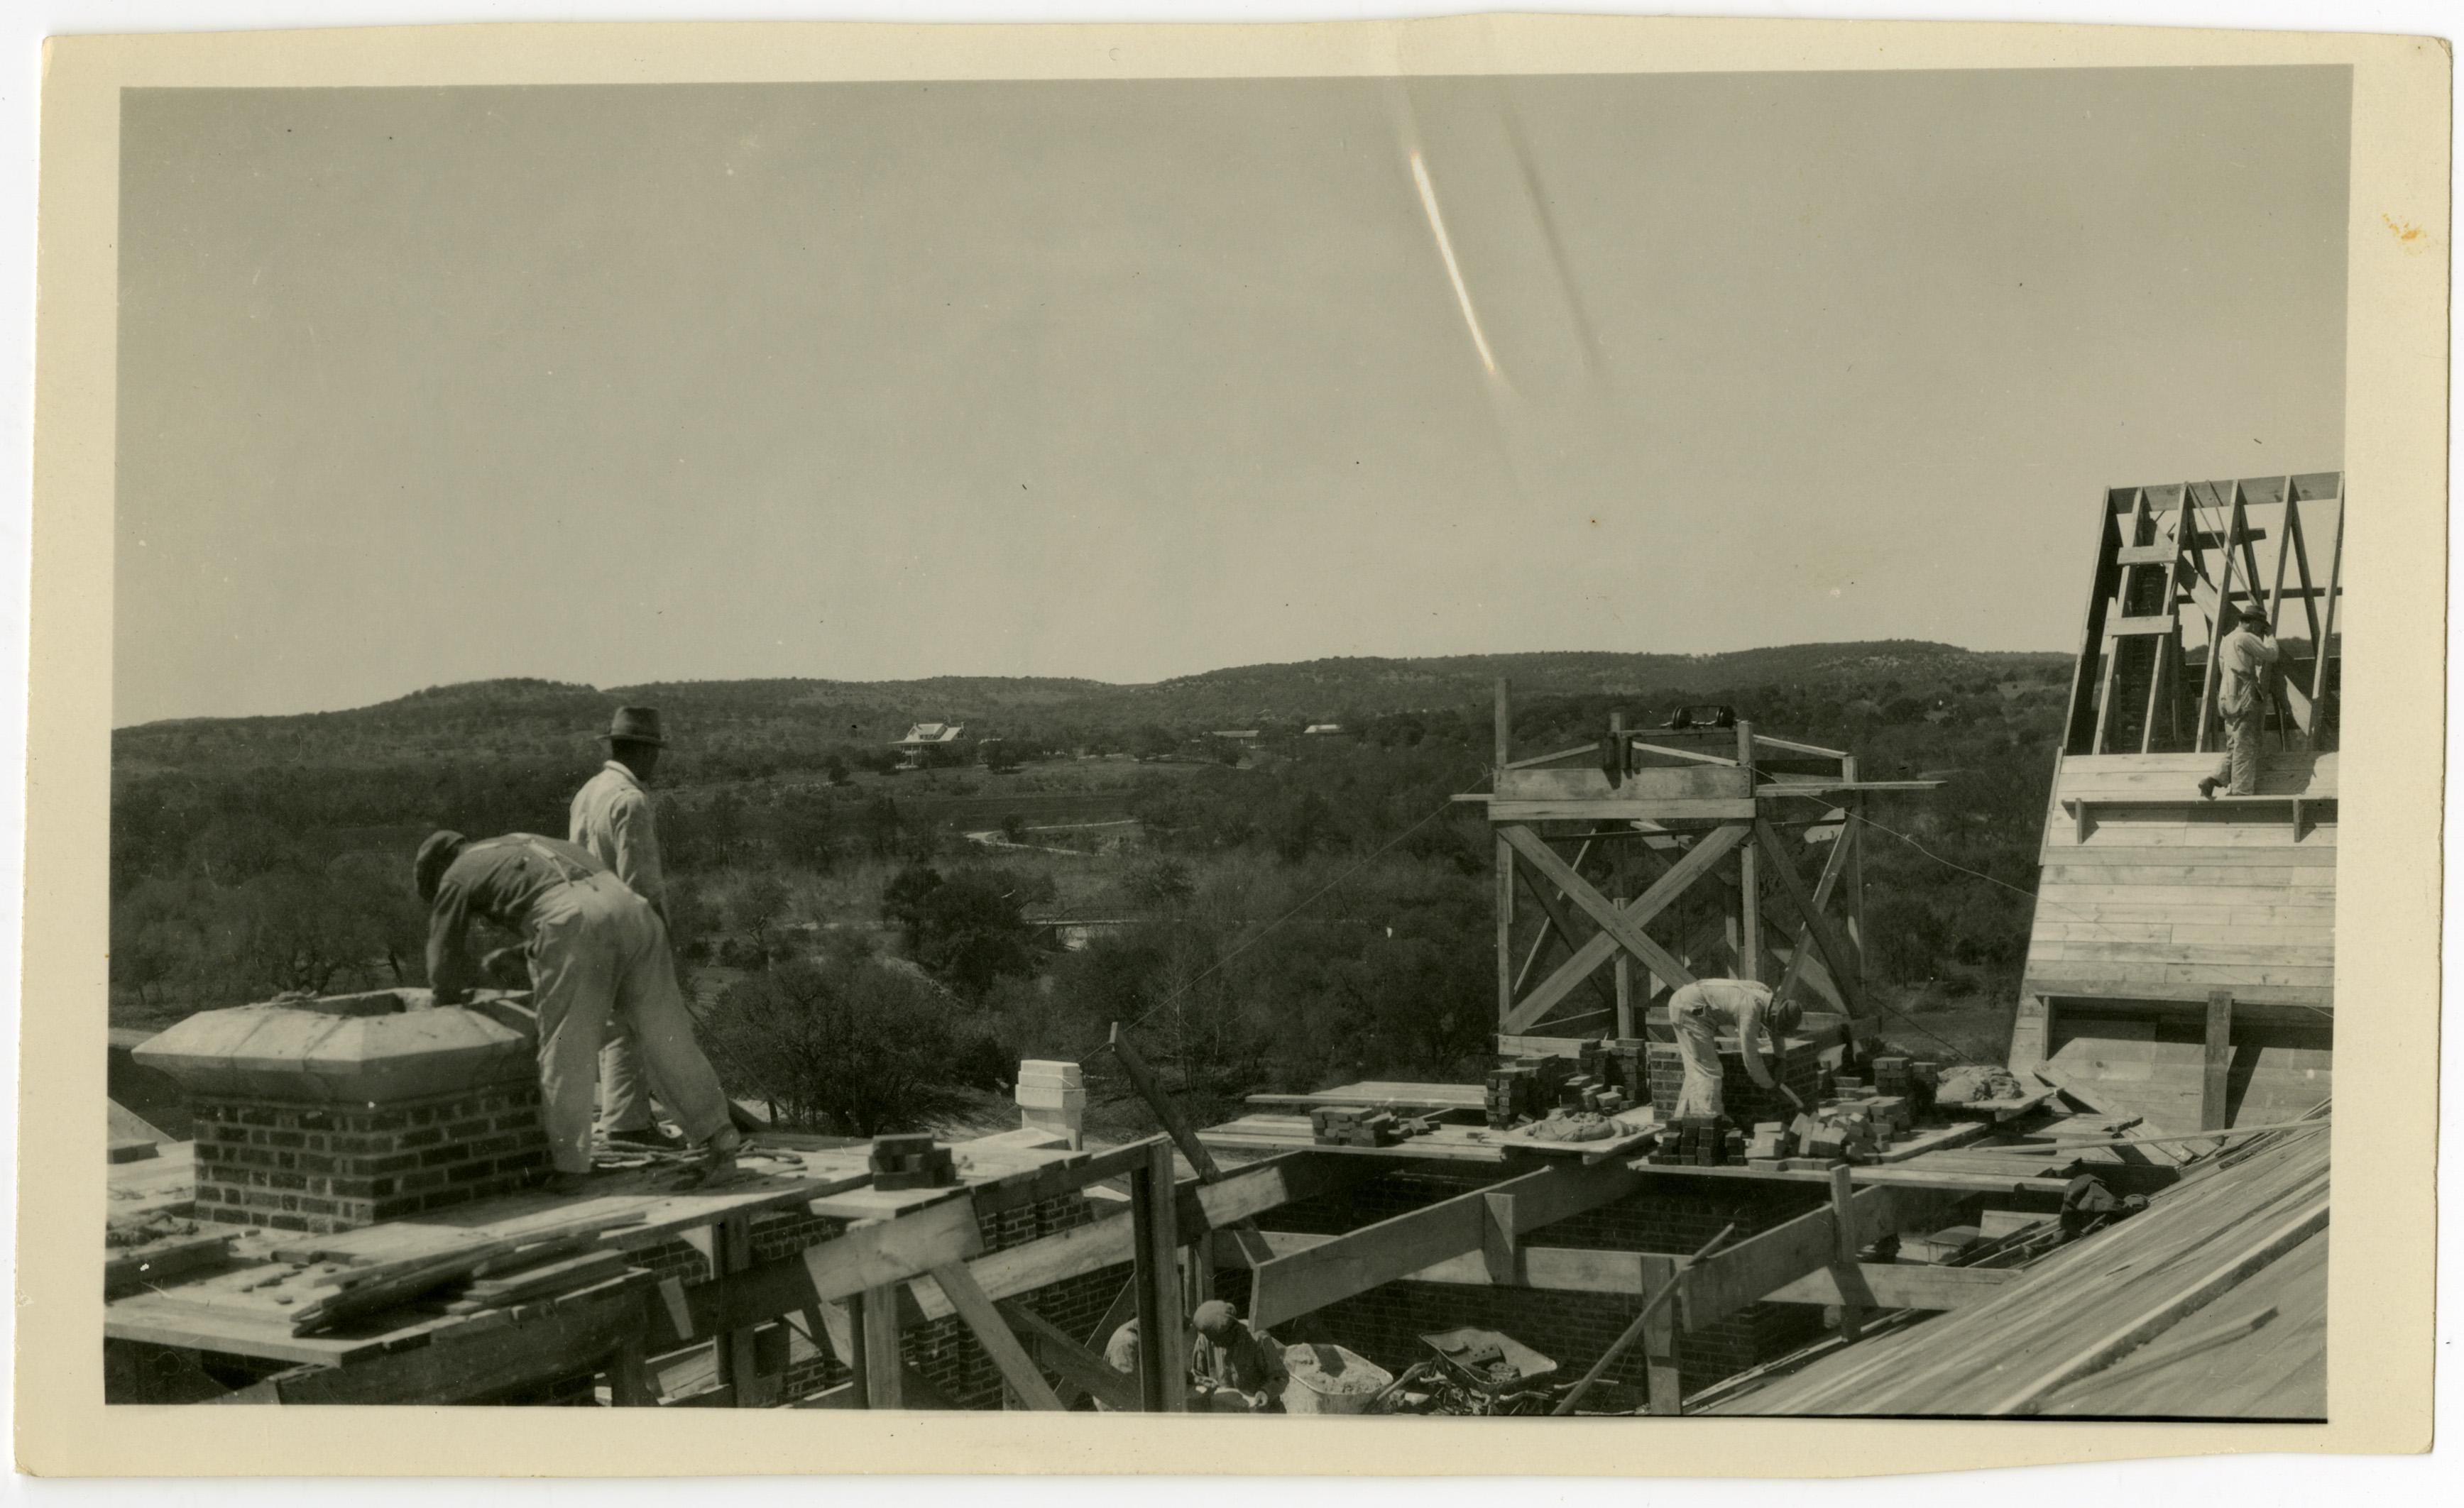 Weir Building Construction